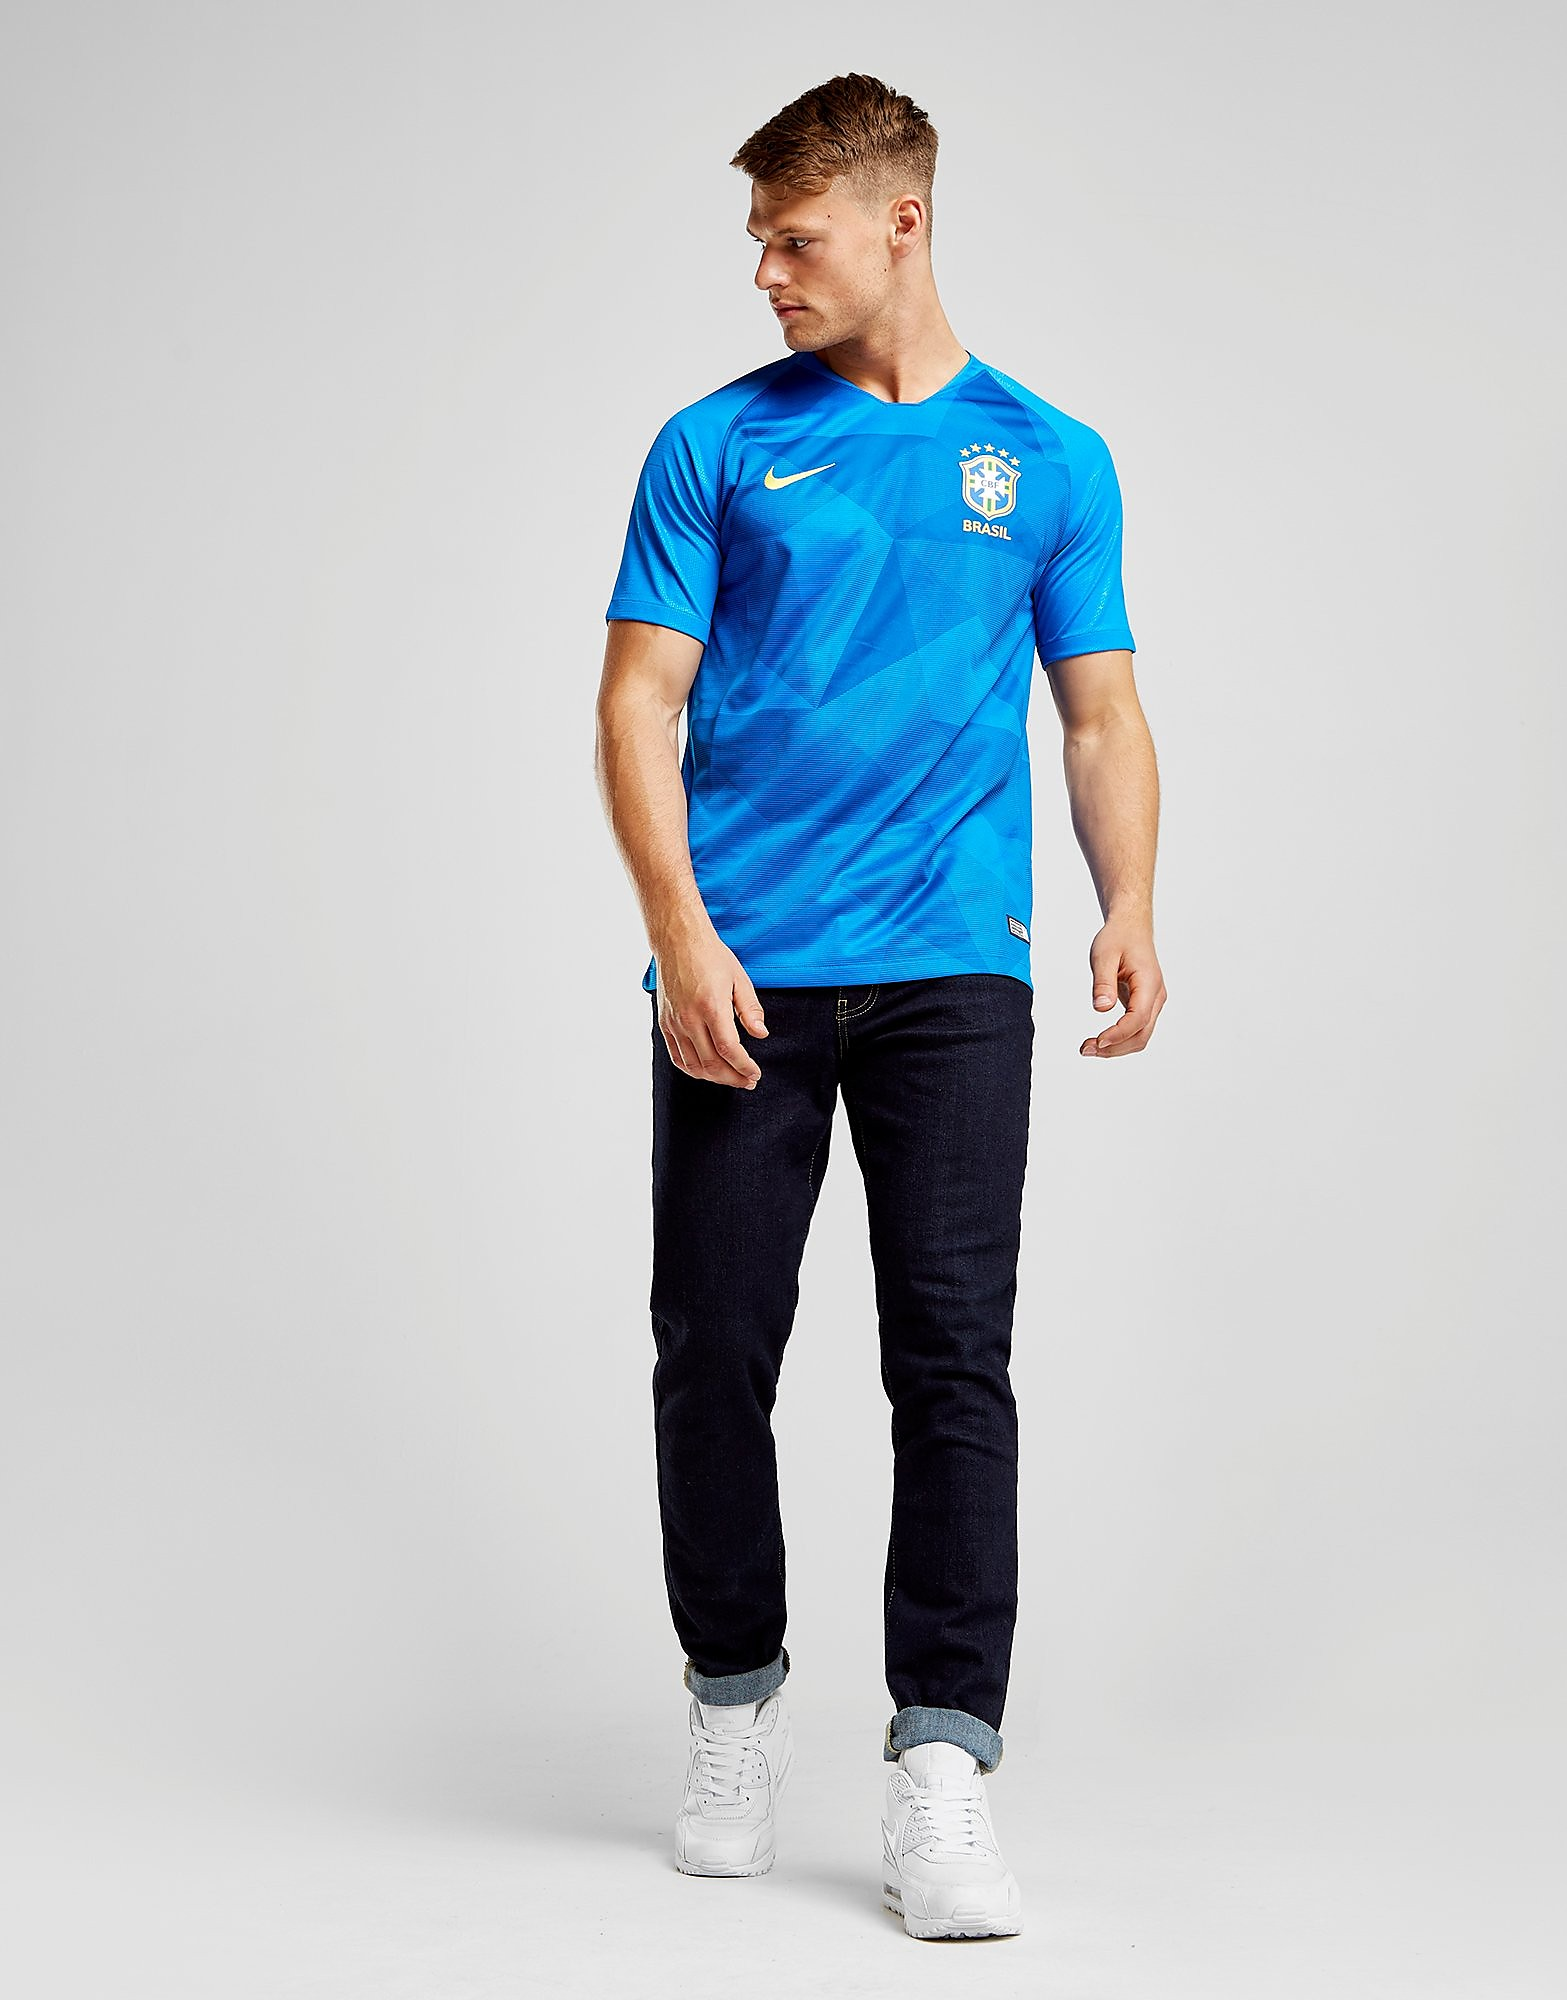 Nike Maillot Away Brésil 2018 Homme